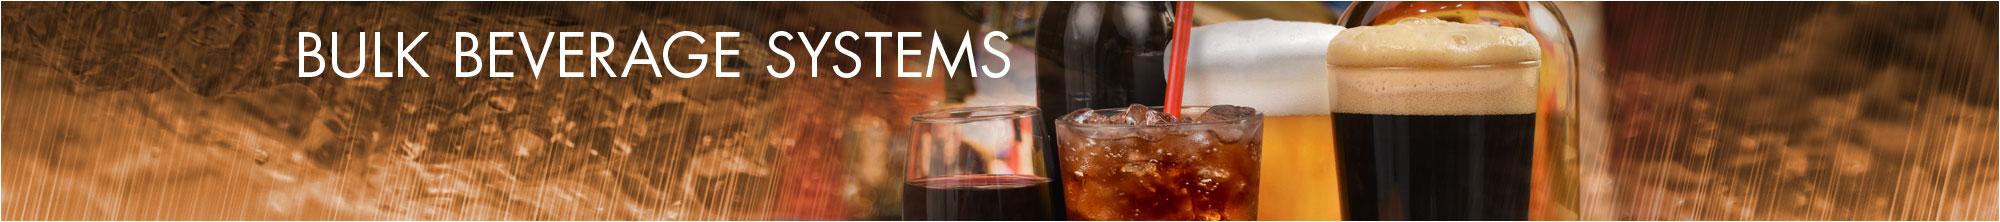 Bulk Beverage Systems